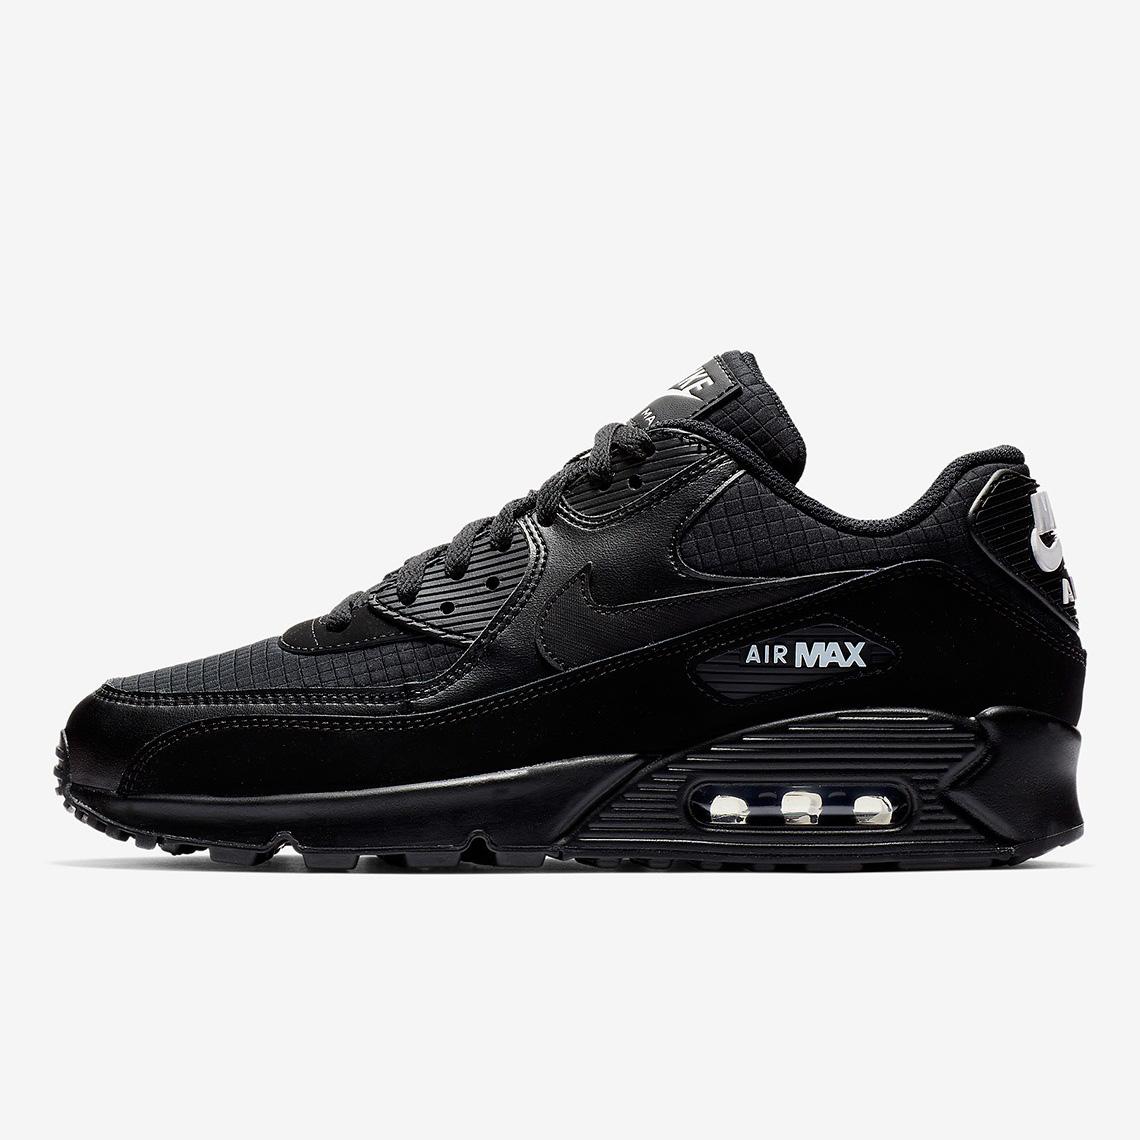 6c5d584a5e6 Nike Air Max 90 Essential - SPORT SHOES Lifestyle Shoes